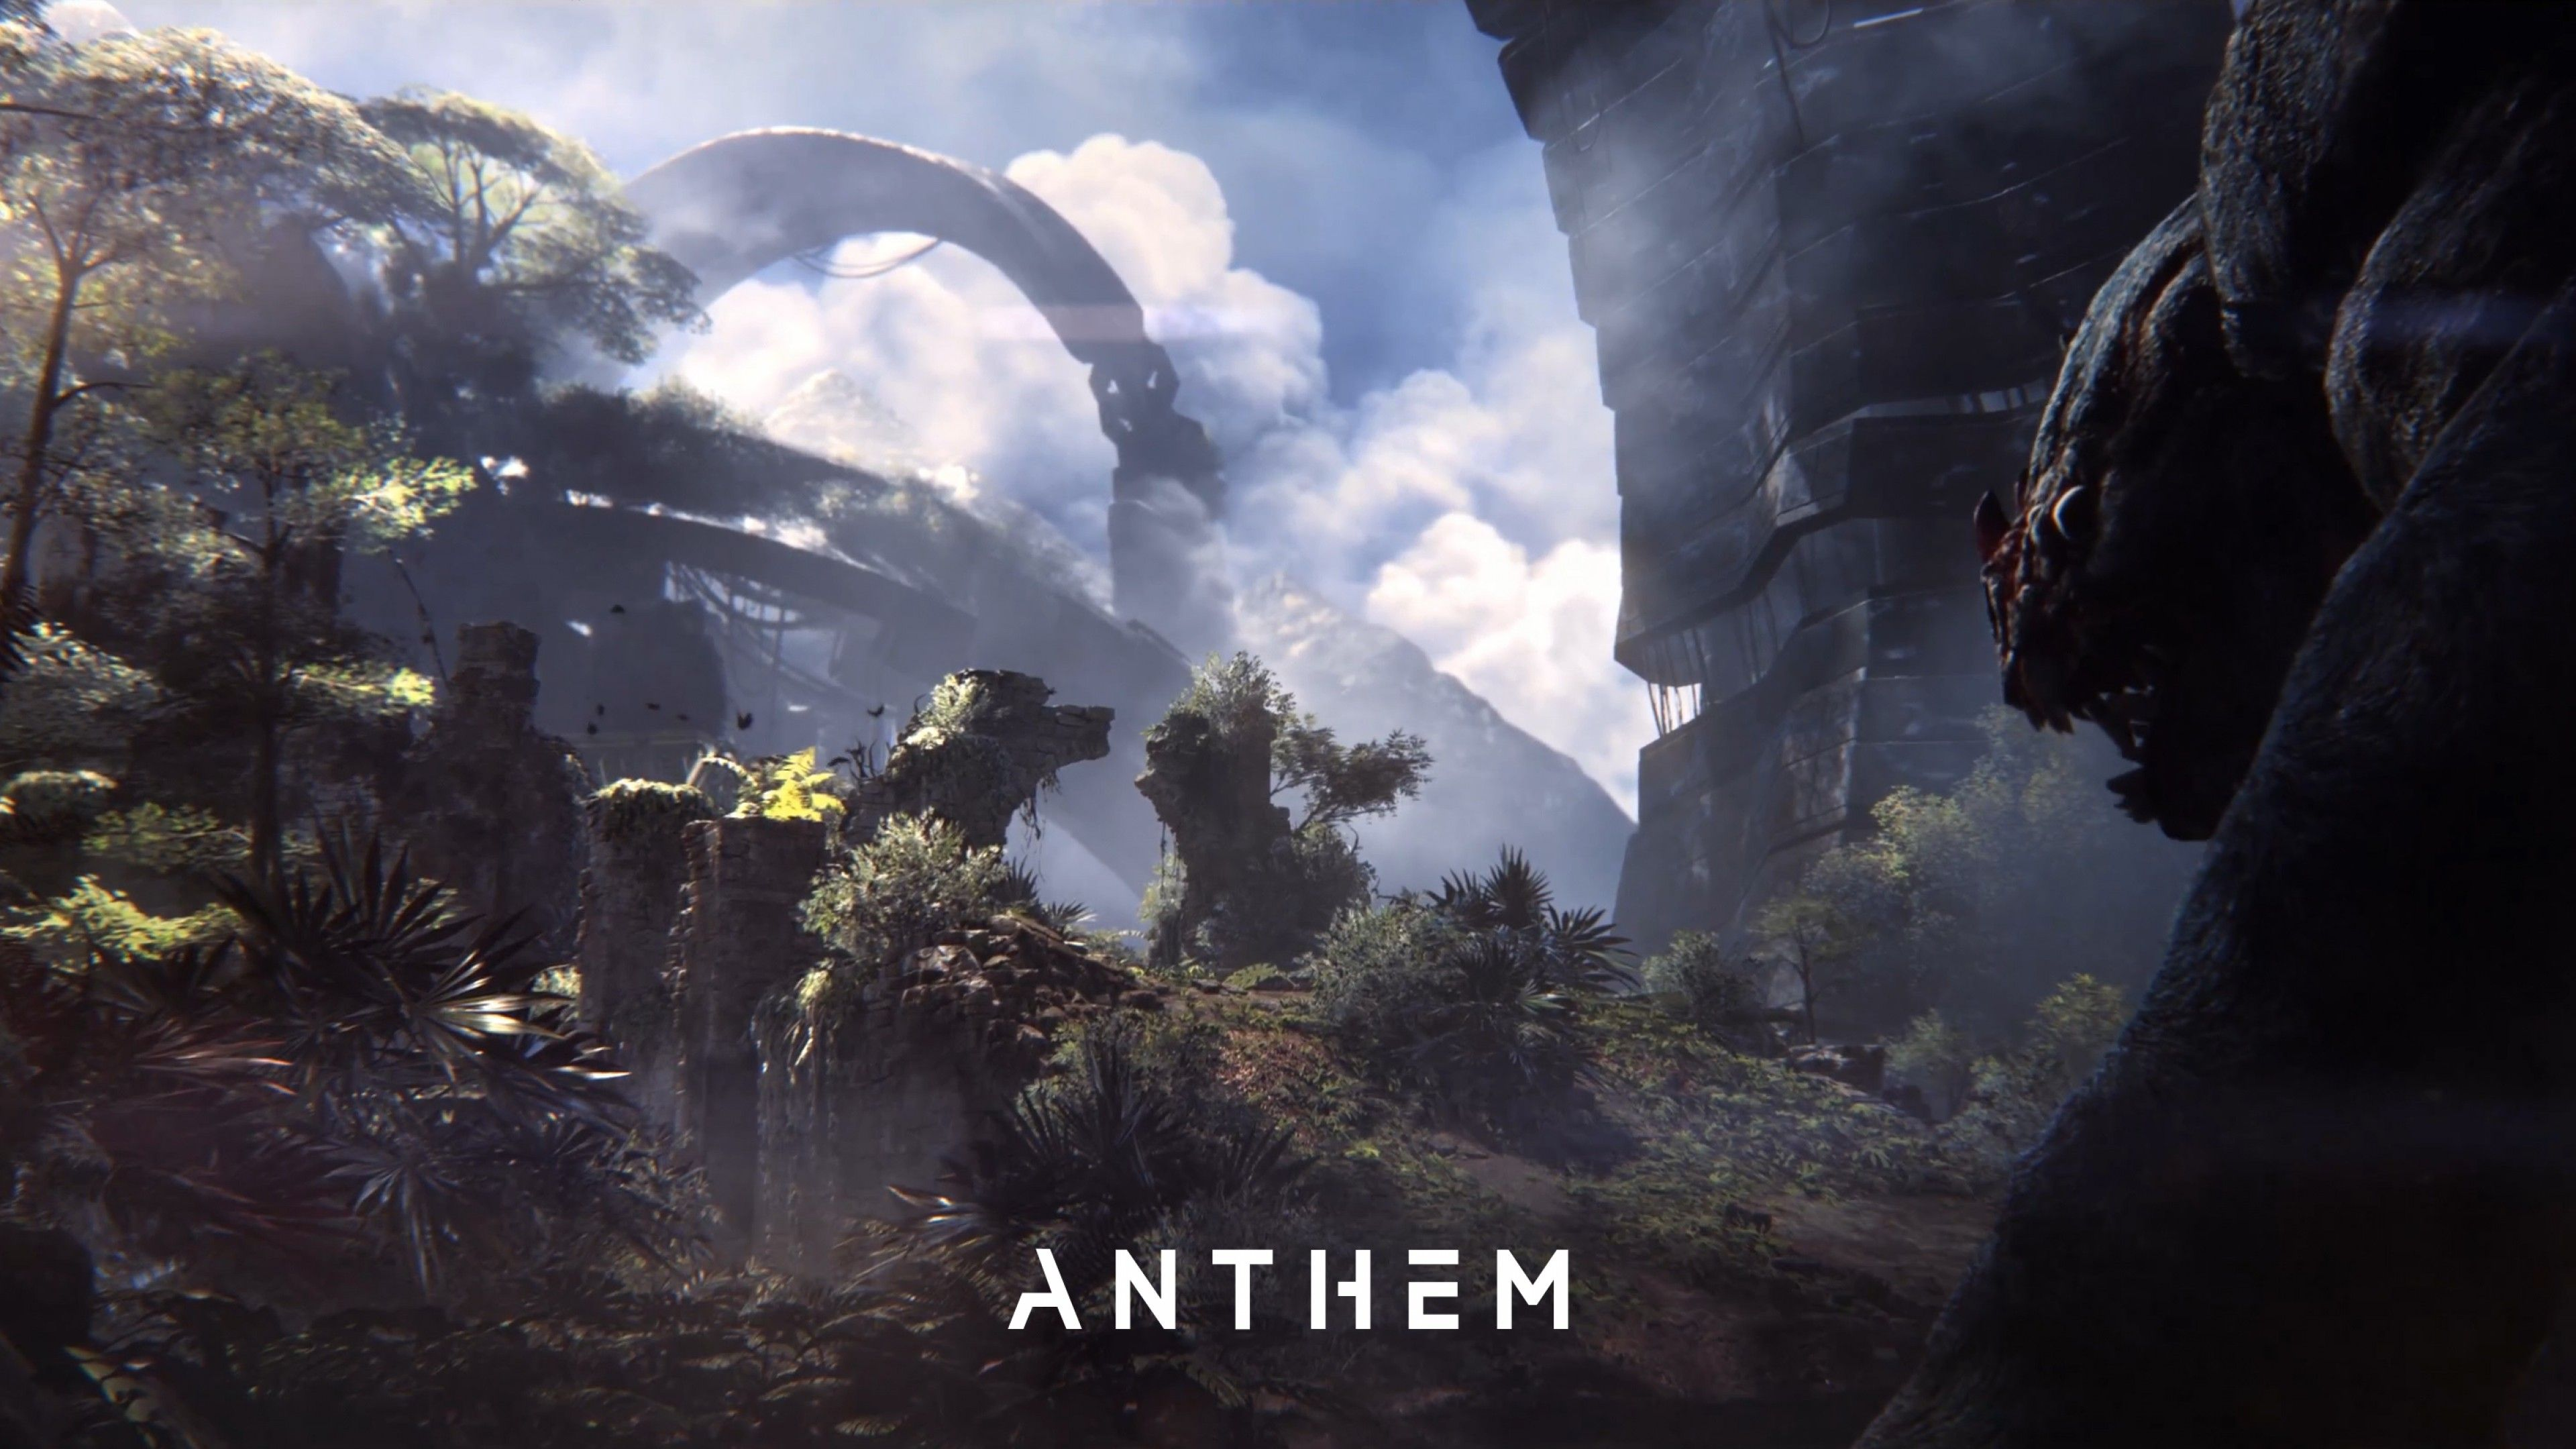 Anthem 4K Wallpapers - Top Free Anthem 4K Backgrounds